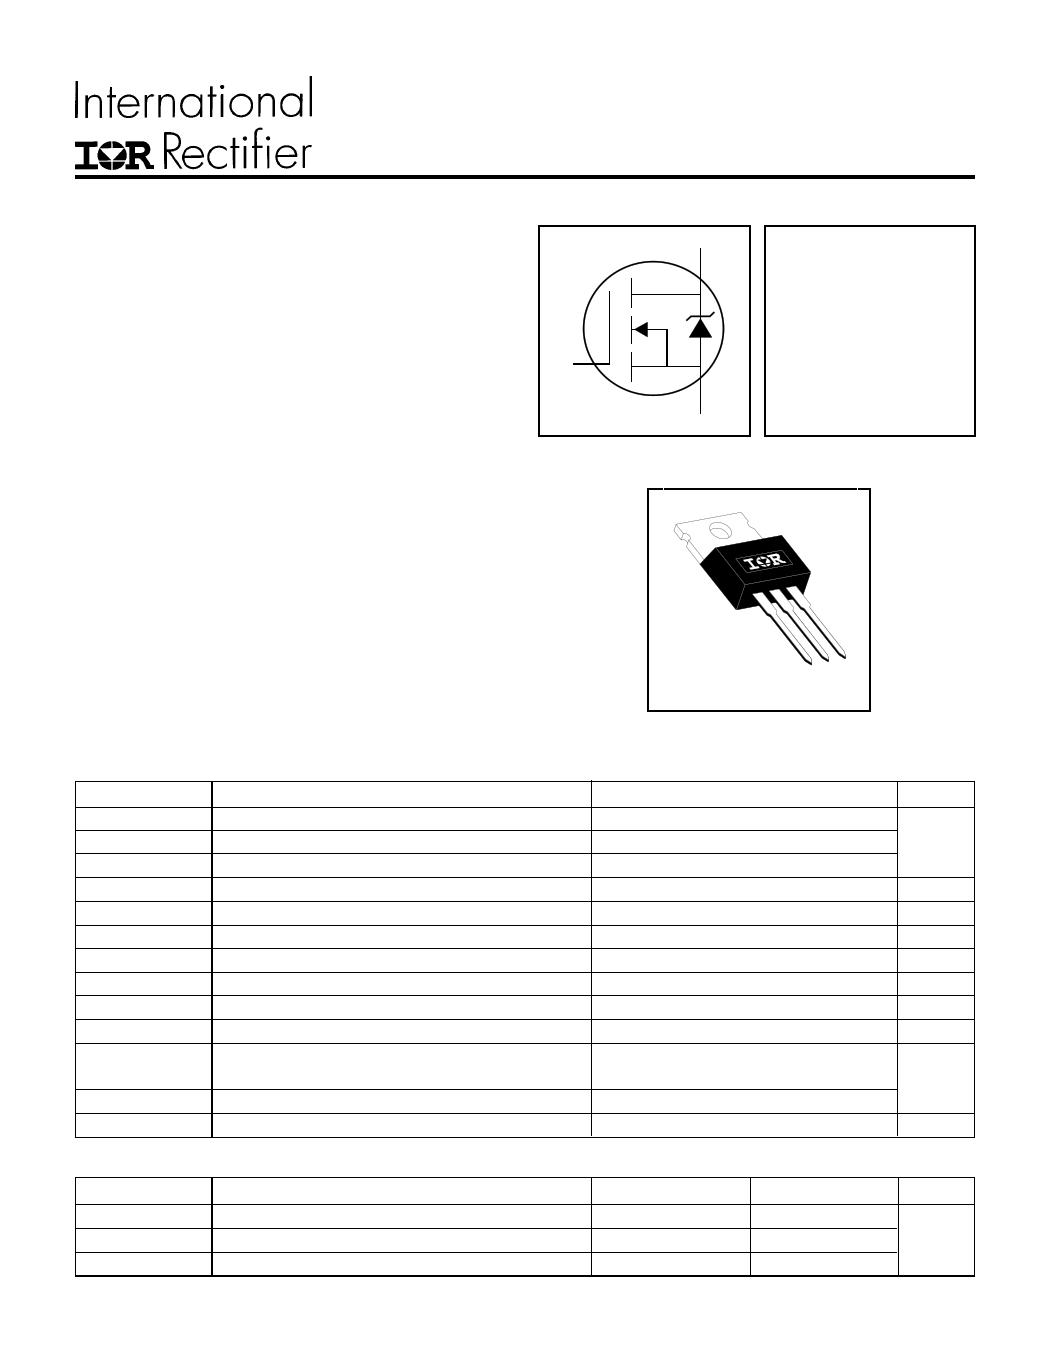 IRFZ48N Datasheet, IRFZ48N PDF,ピン配置, 機能